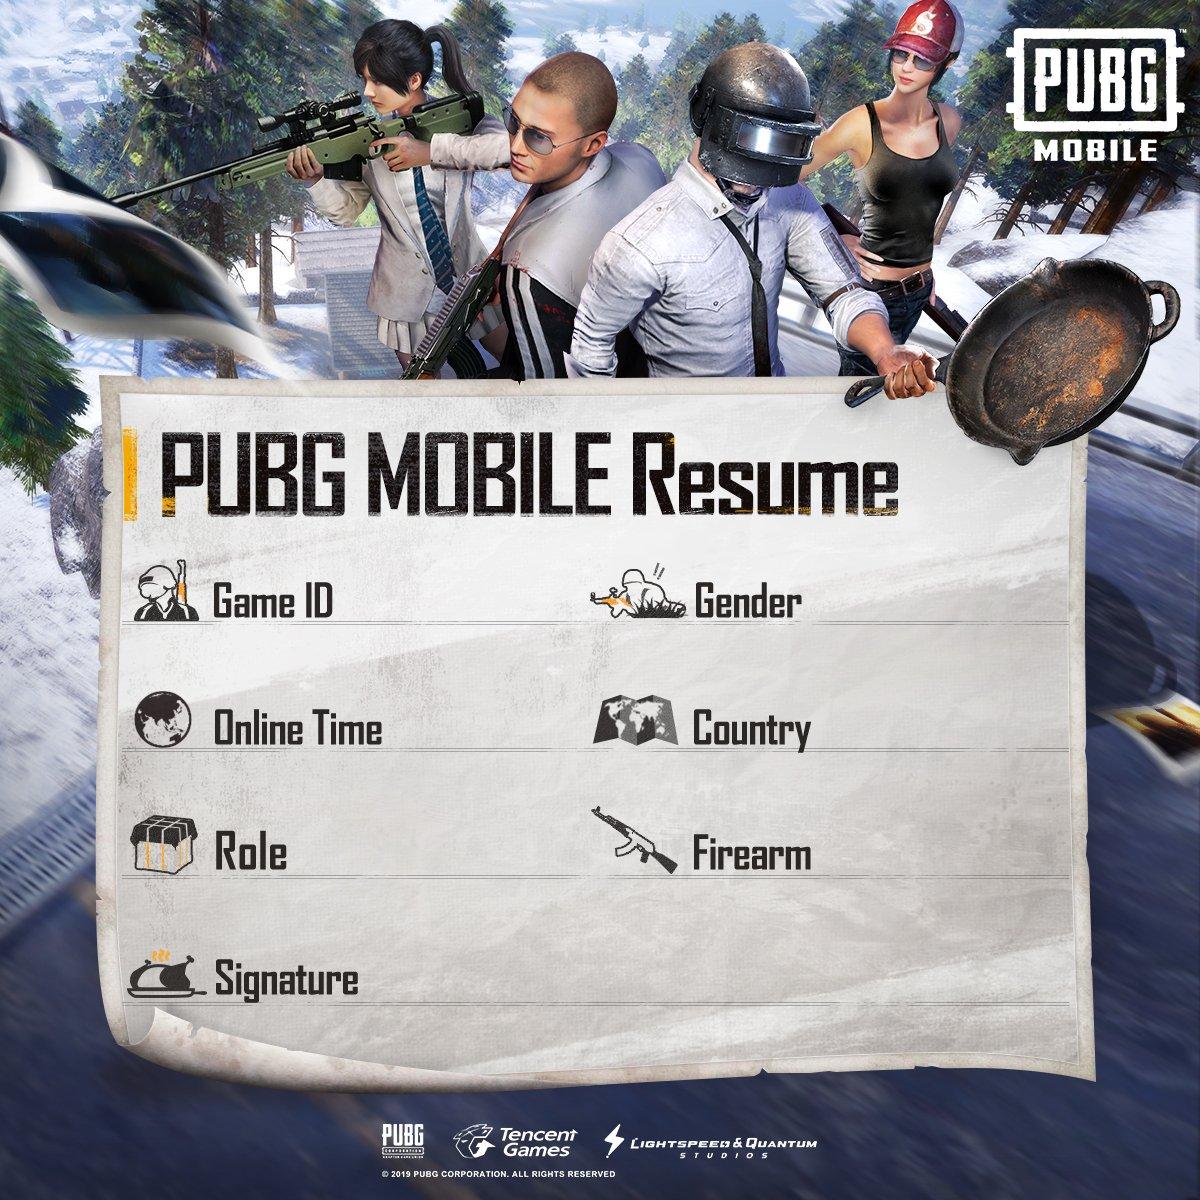 PUBG MOBILE on Twitter: